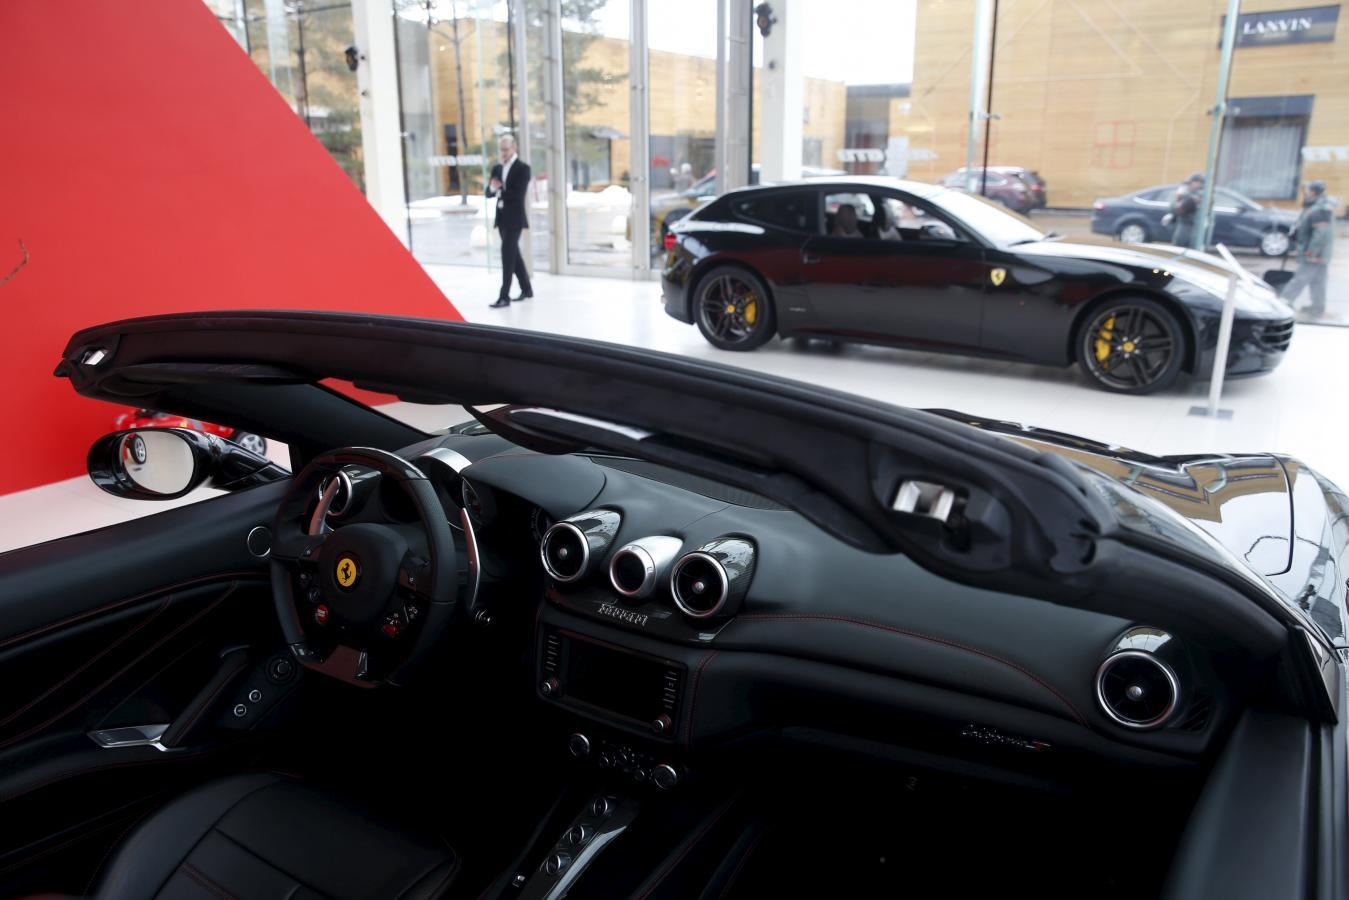 Russia's crisis produces a paradox: surging luxury car sales